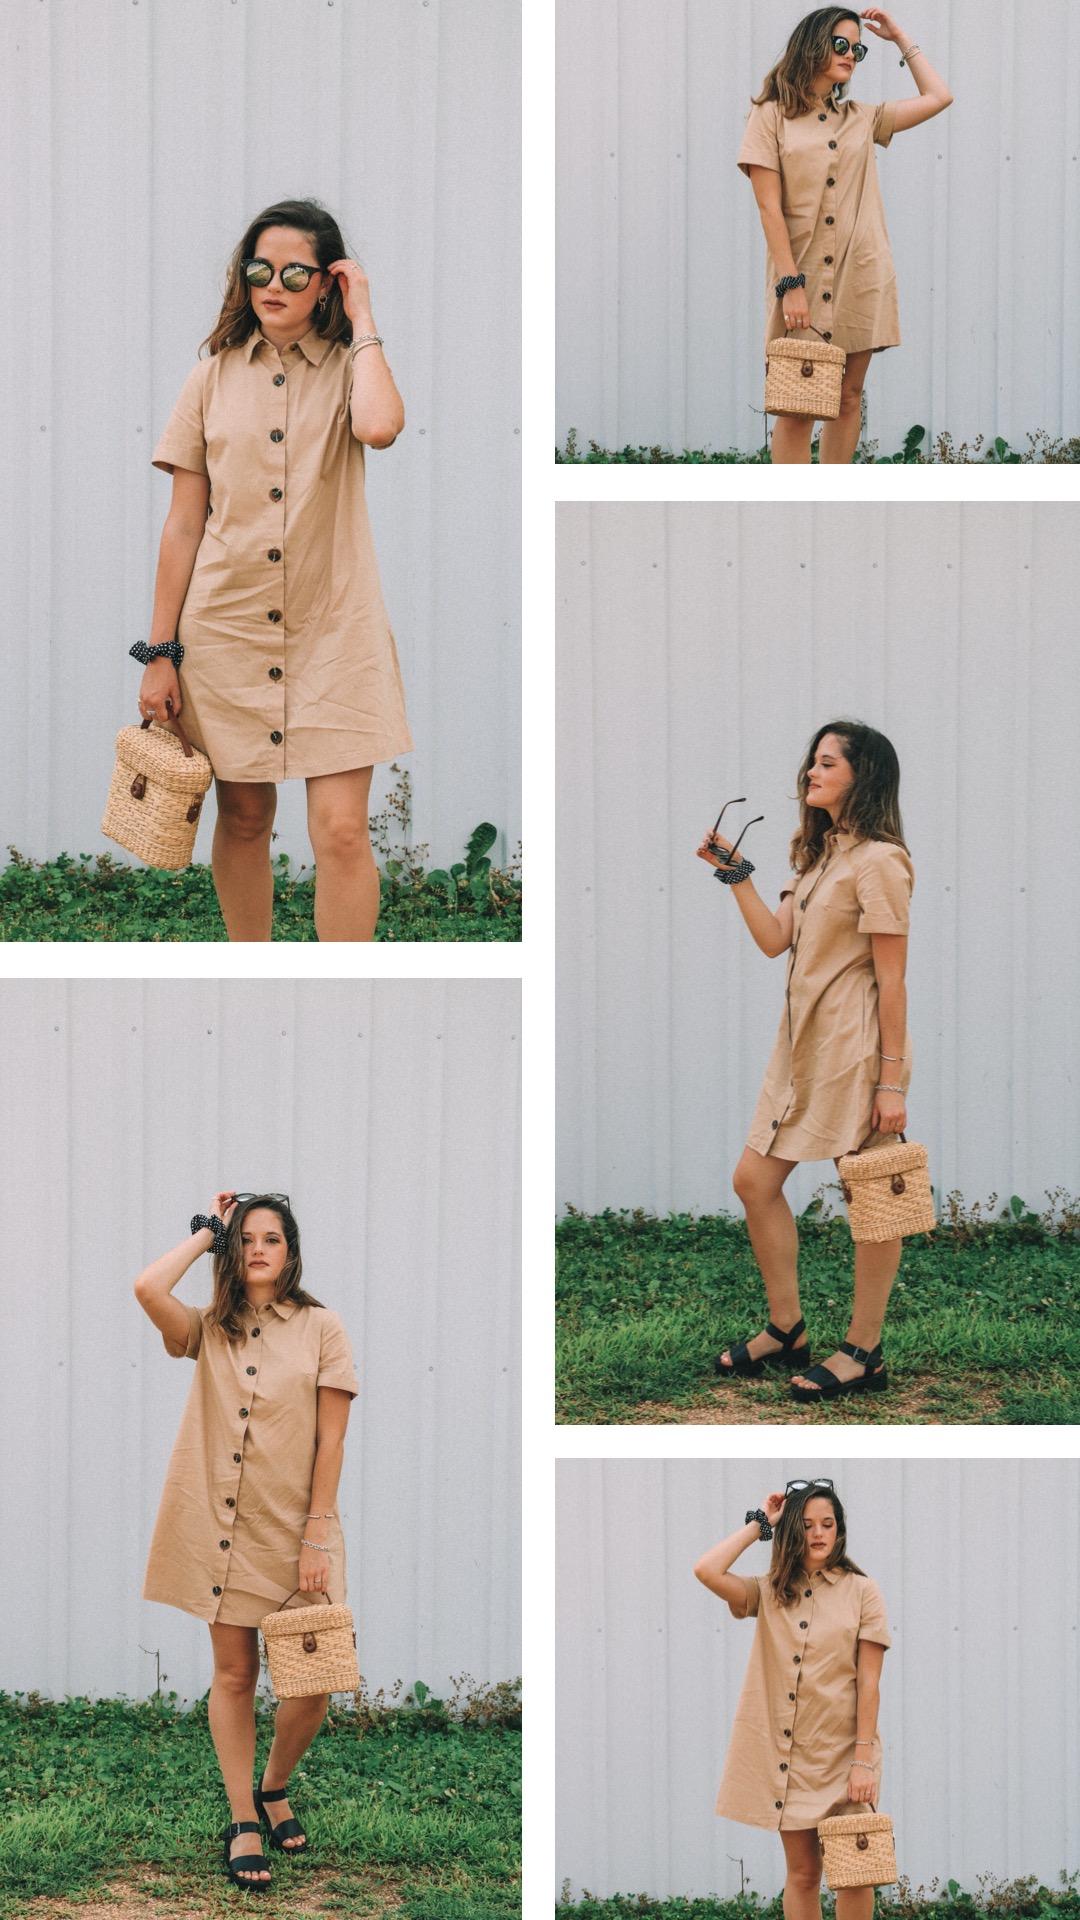 Fashion blogger Kathleen Harper's fall outfit idea with a khaki shirtdress.